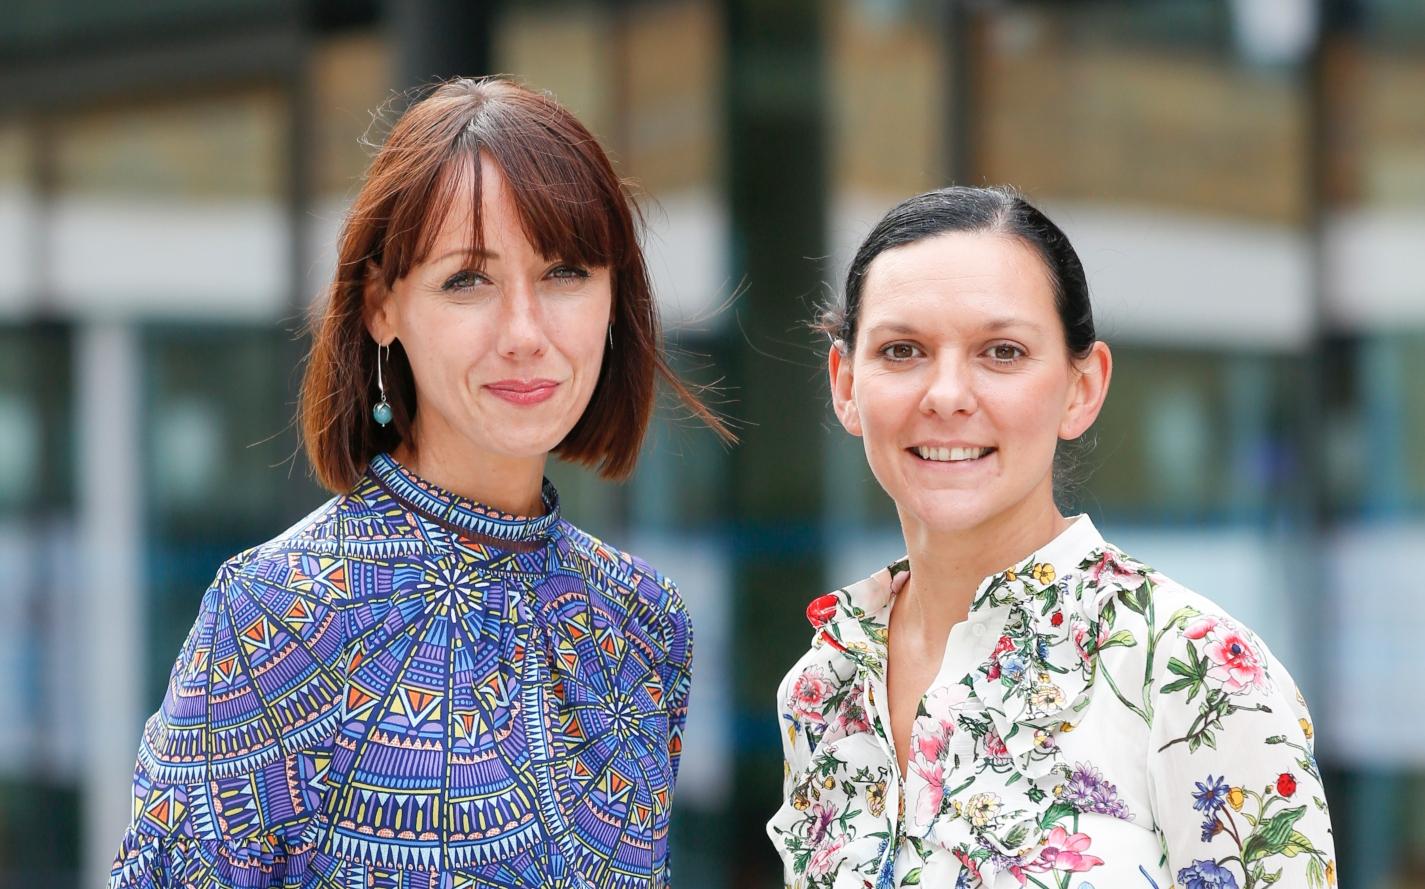 Geri Ward and Claire Hartridge